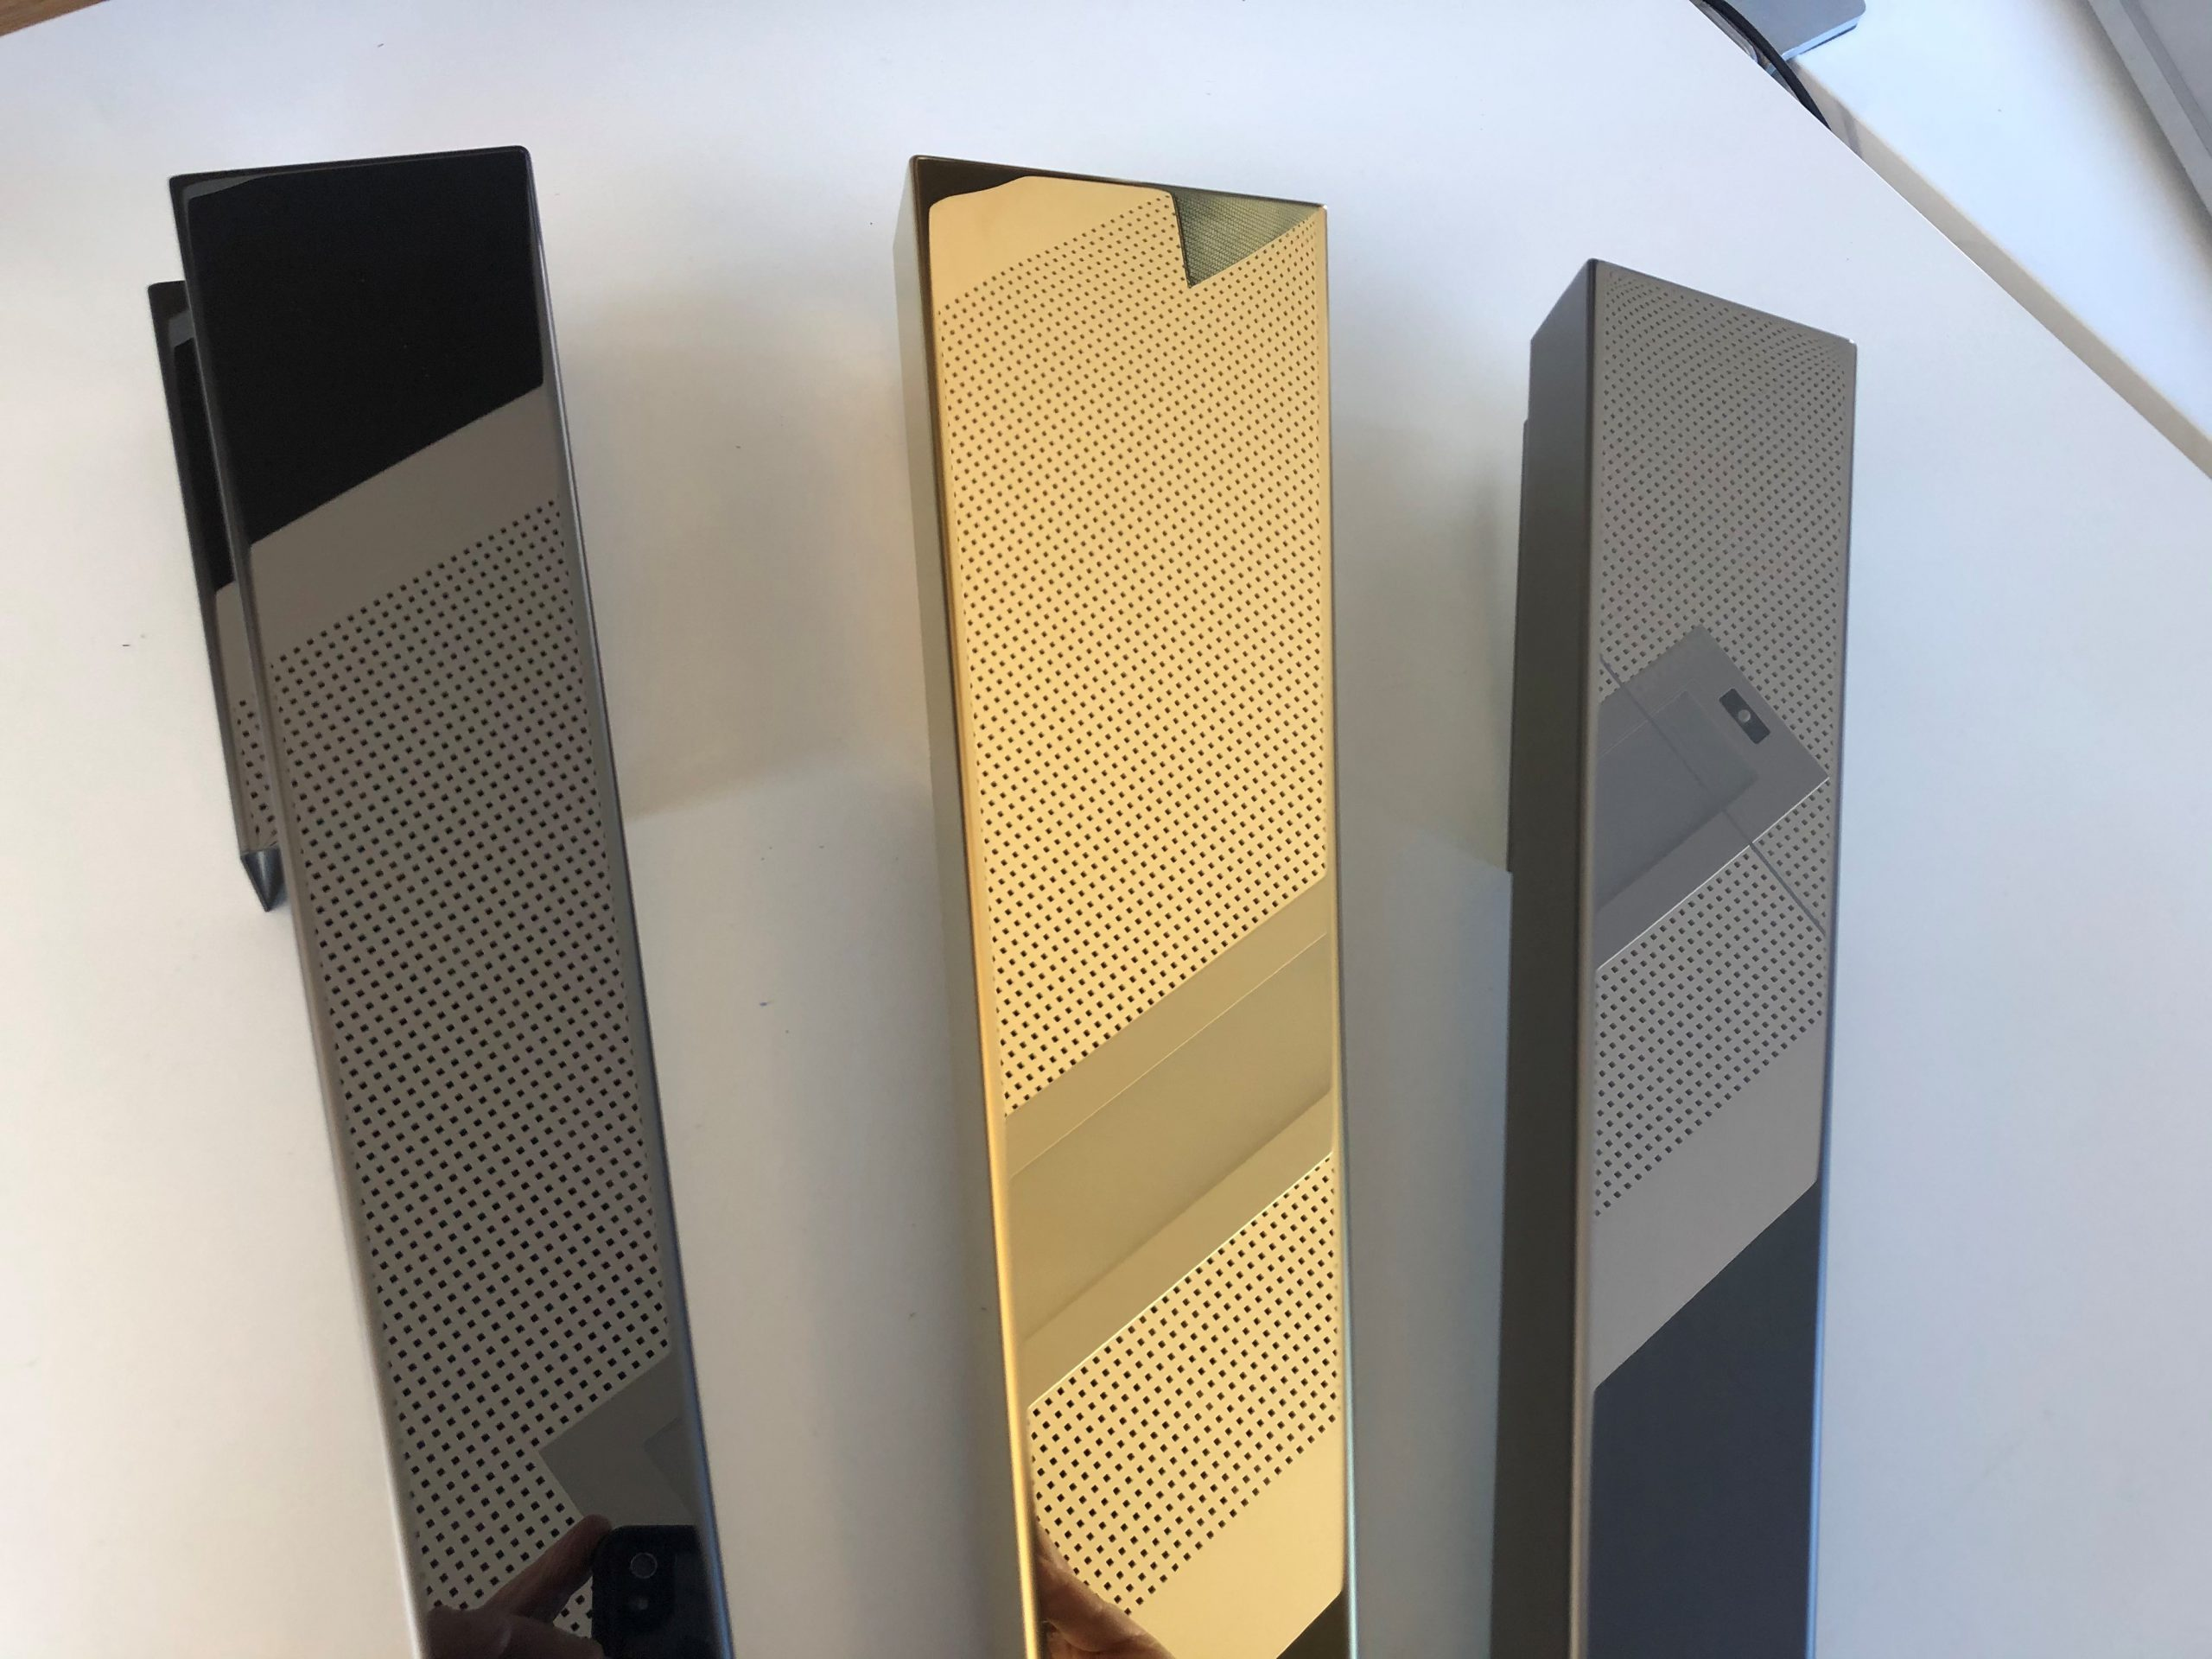 Edelstahl black-gold mirror PVD Tin